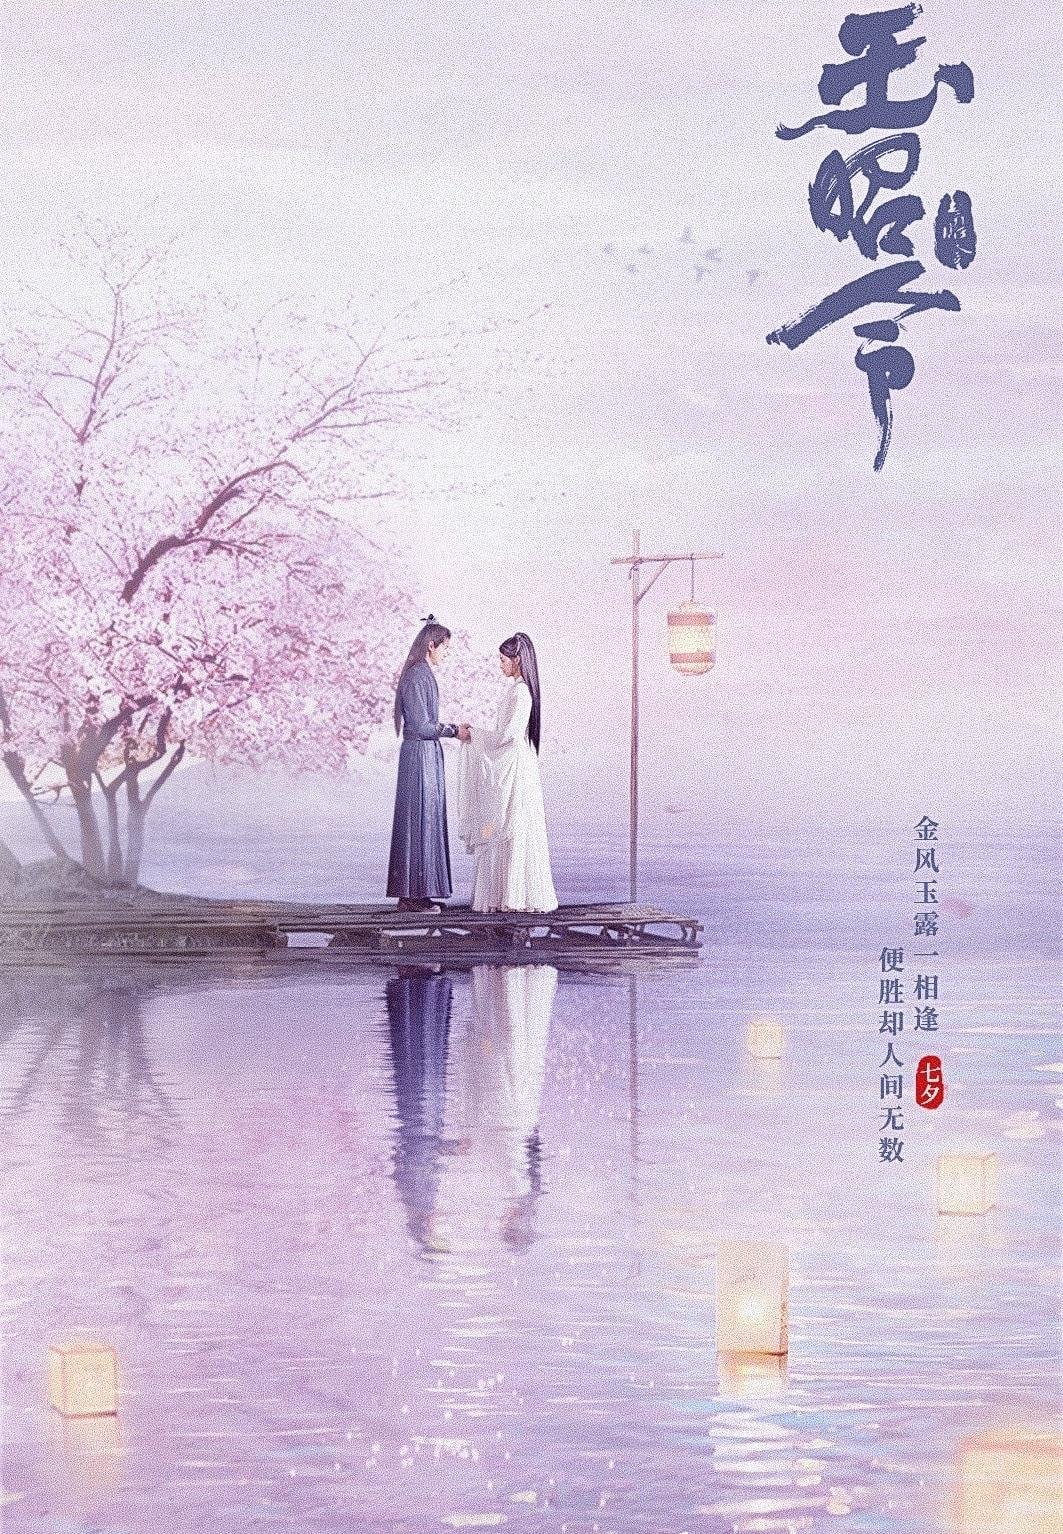 دانلود زیرنویس فارسی سریال Yu Zhao Ling